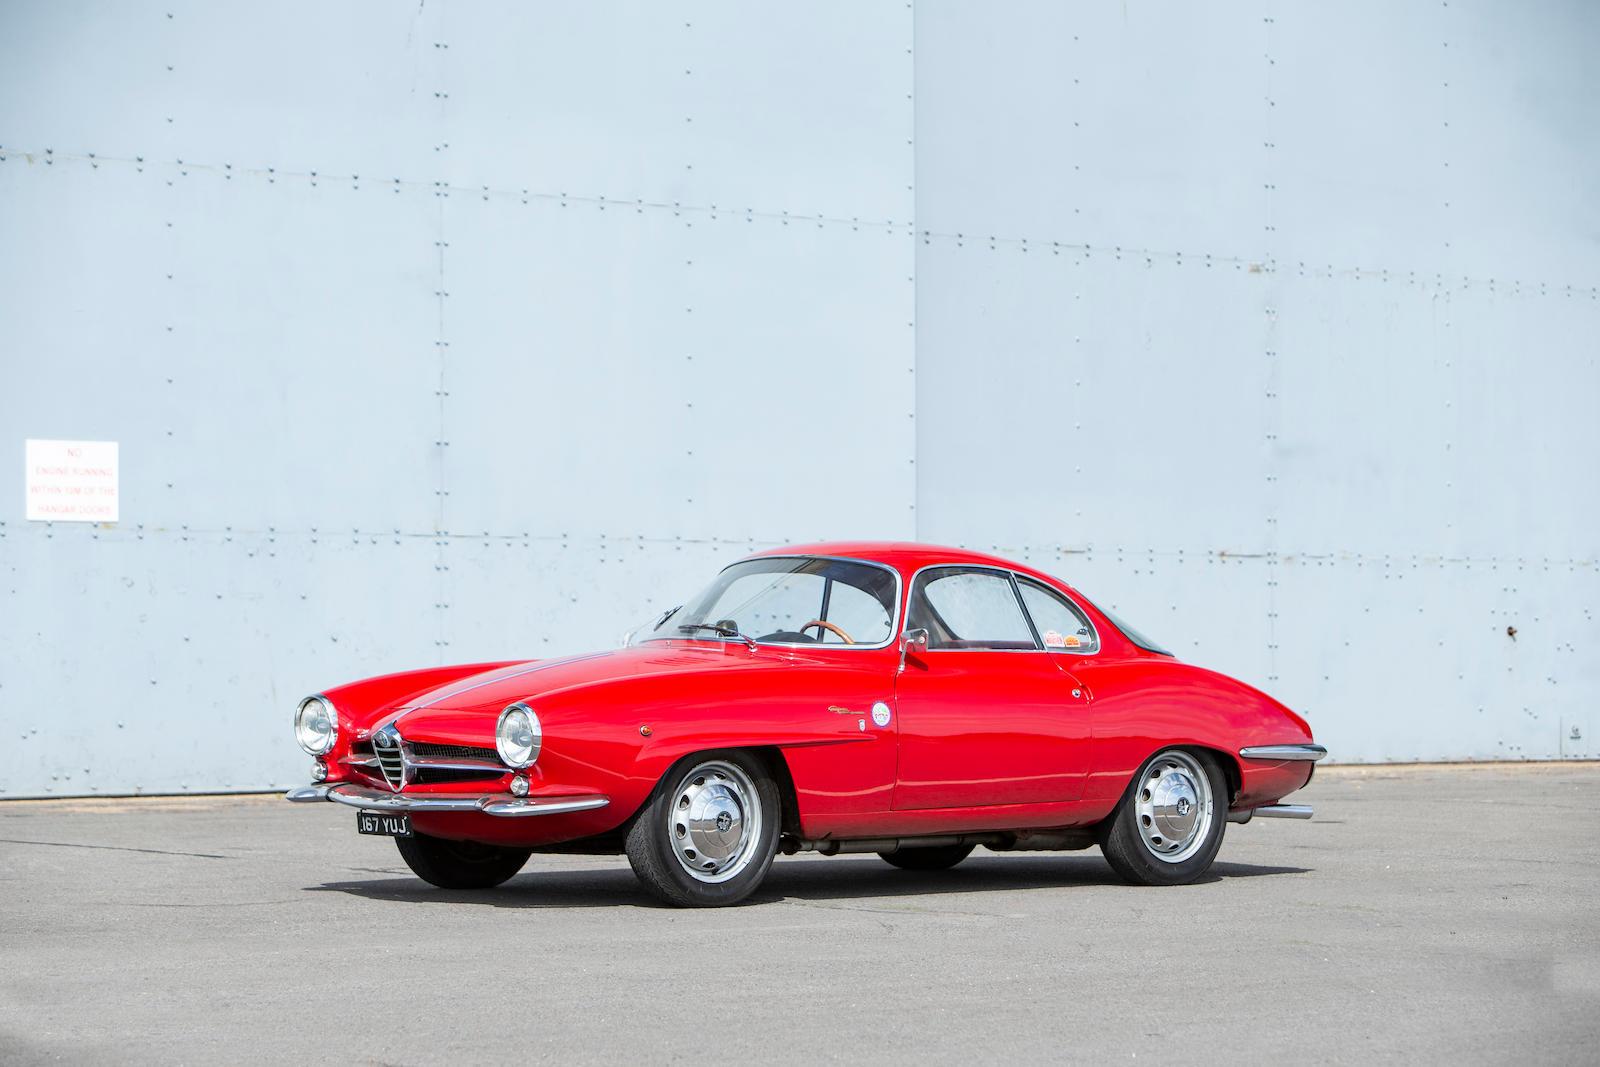 1961 Alfa Romeo Giulietta Sprint Speciale Coupé